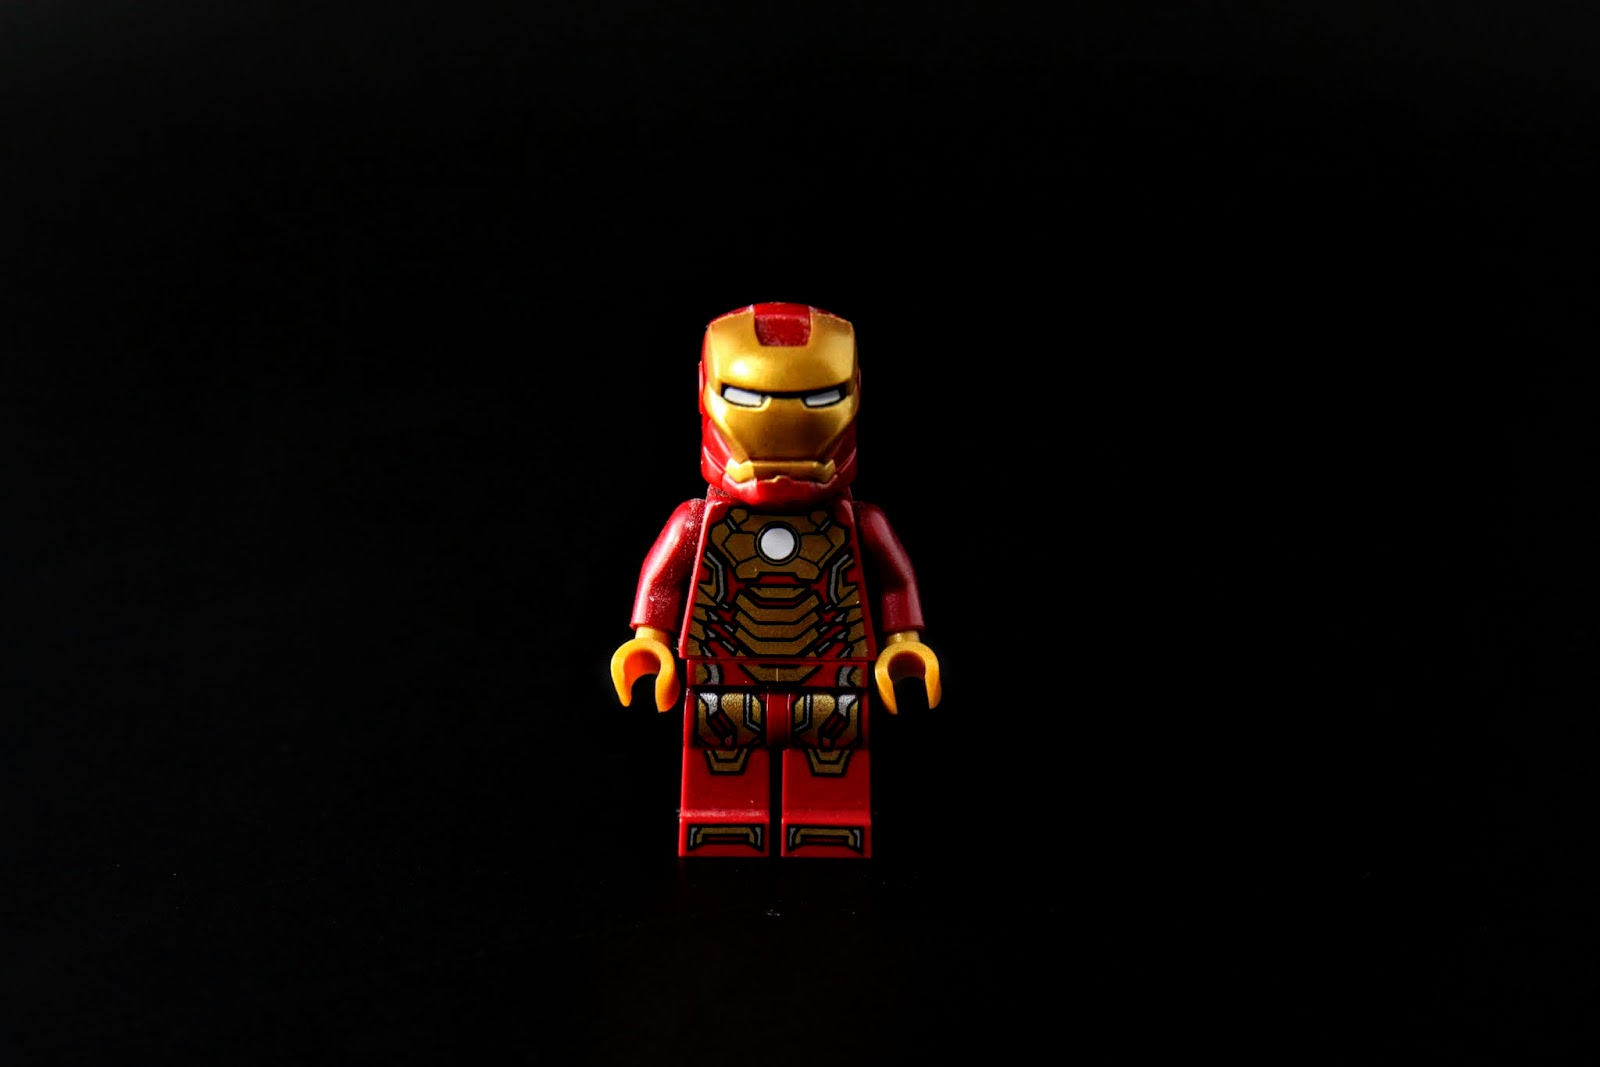 LEGO的鋼鐵人基本上只能從身上的樣子來分辨型號